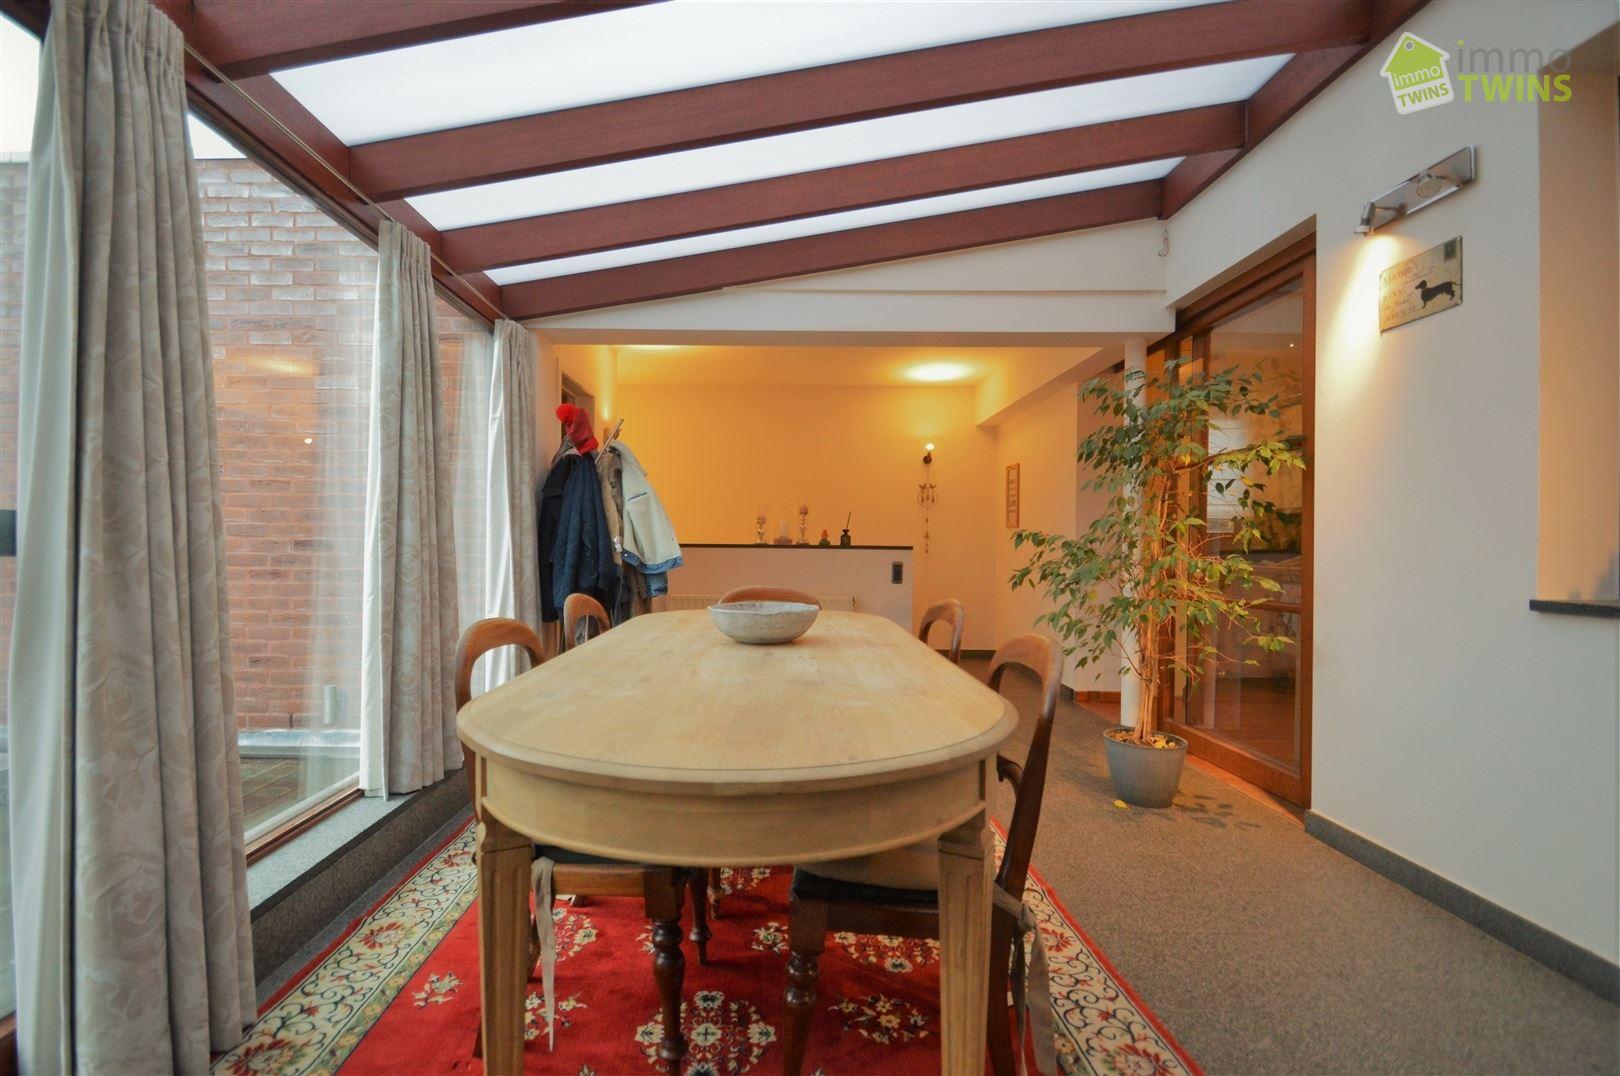 Foto 10 : Duplex/Penthouse te 2890 SINT-AMANDS (België) - Prijs € 429.000